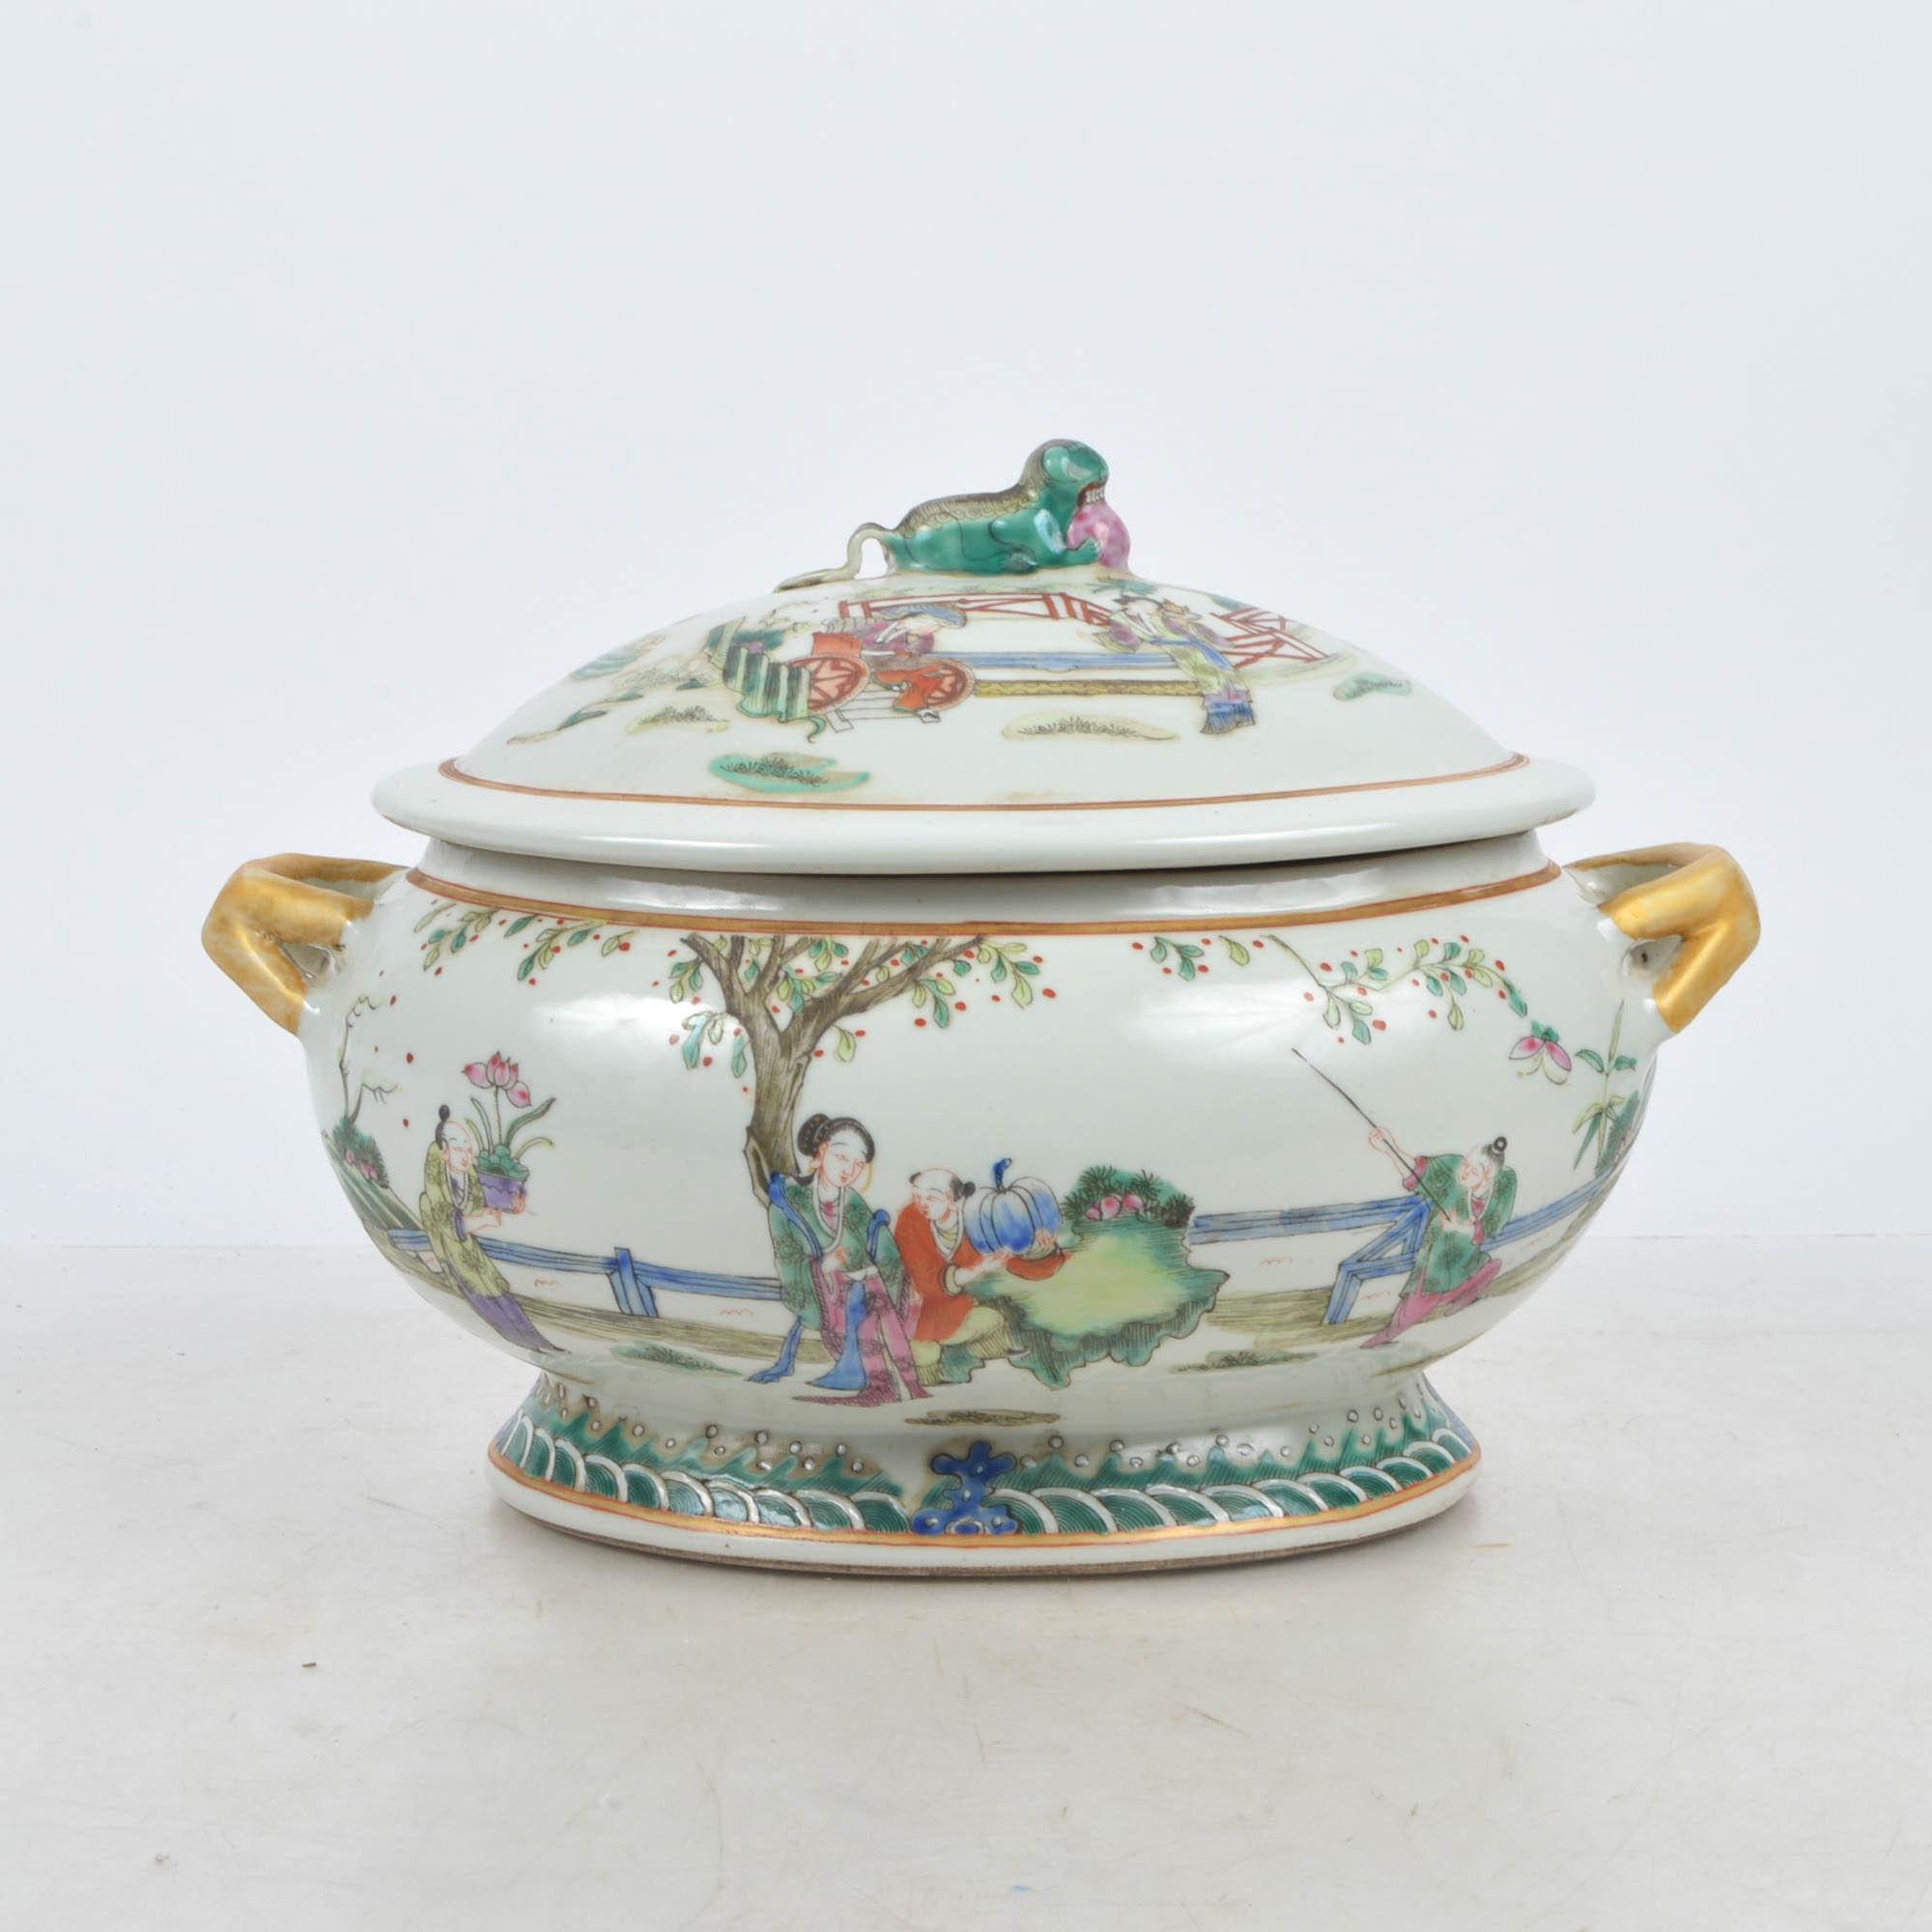 Chinese Porcelain Lidded Tureen